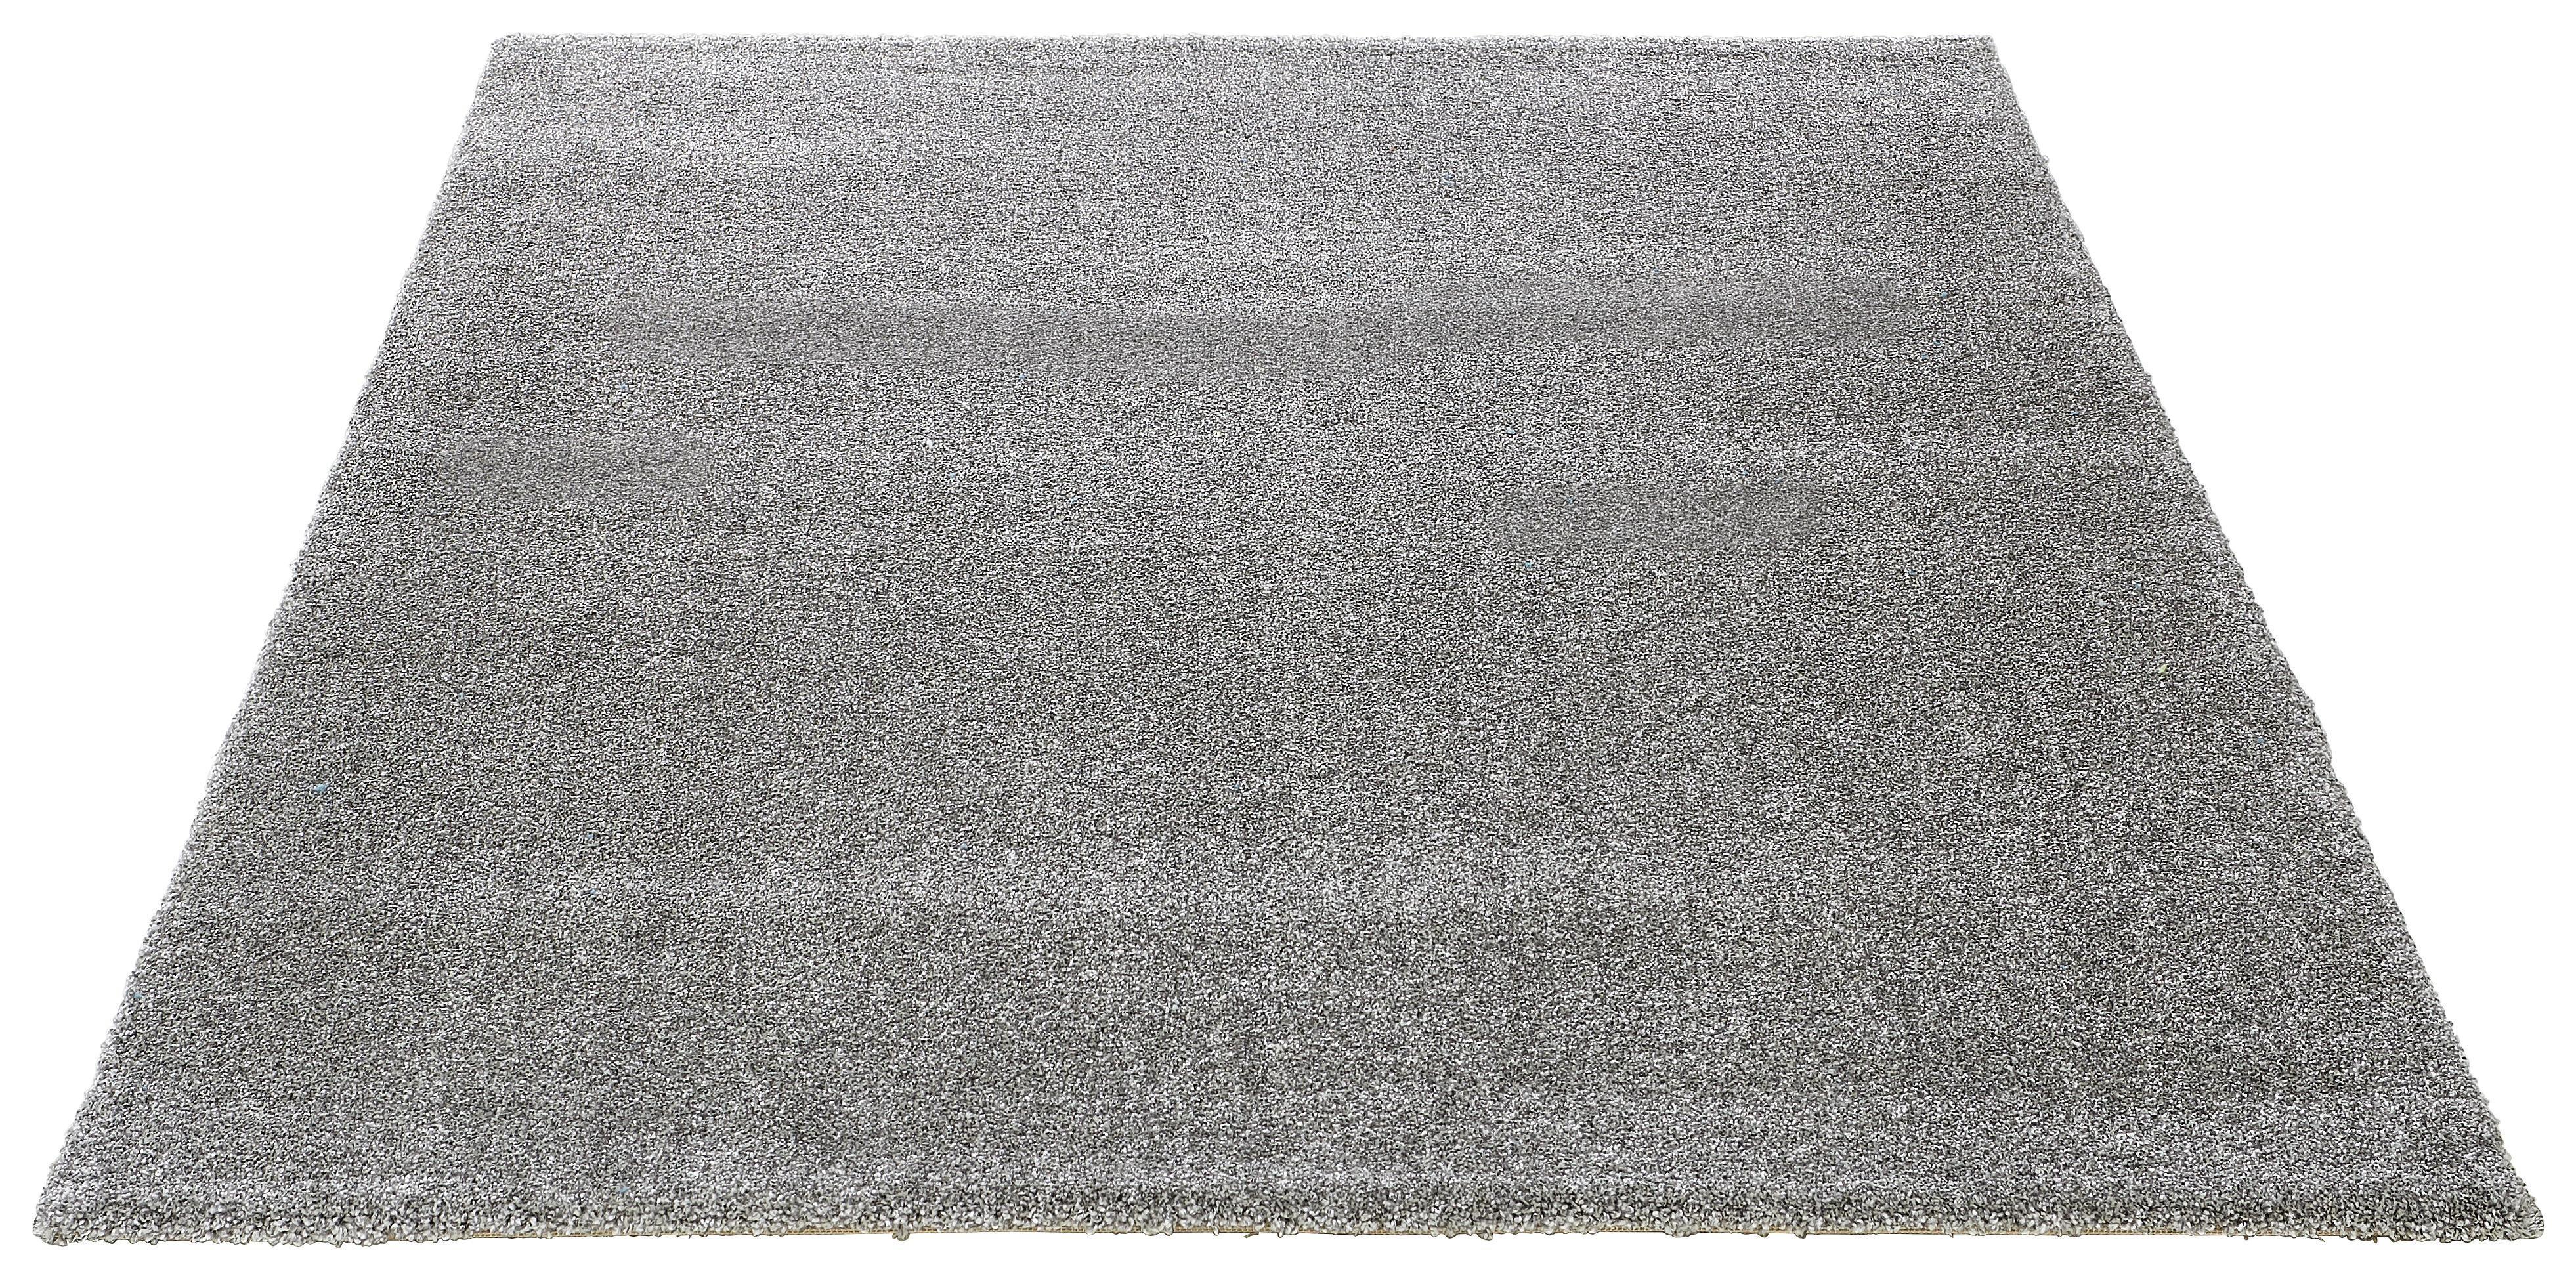 WEBTEPPICH  Grau  140/200 cm - Grau, Basics, Kunststoff/Textil (140/200cm) - NOVEL